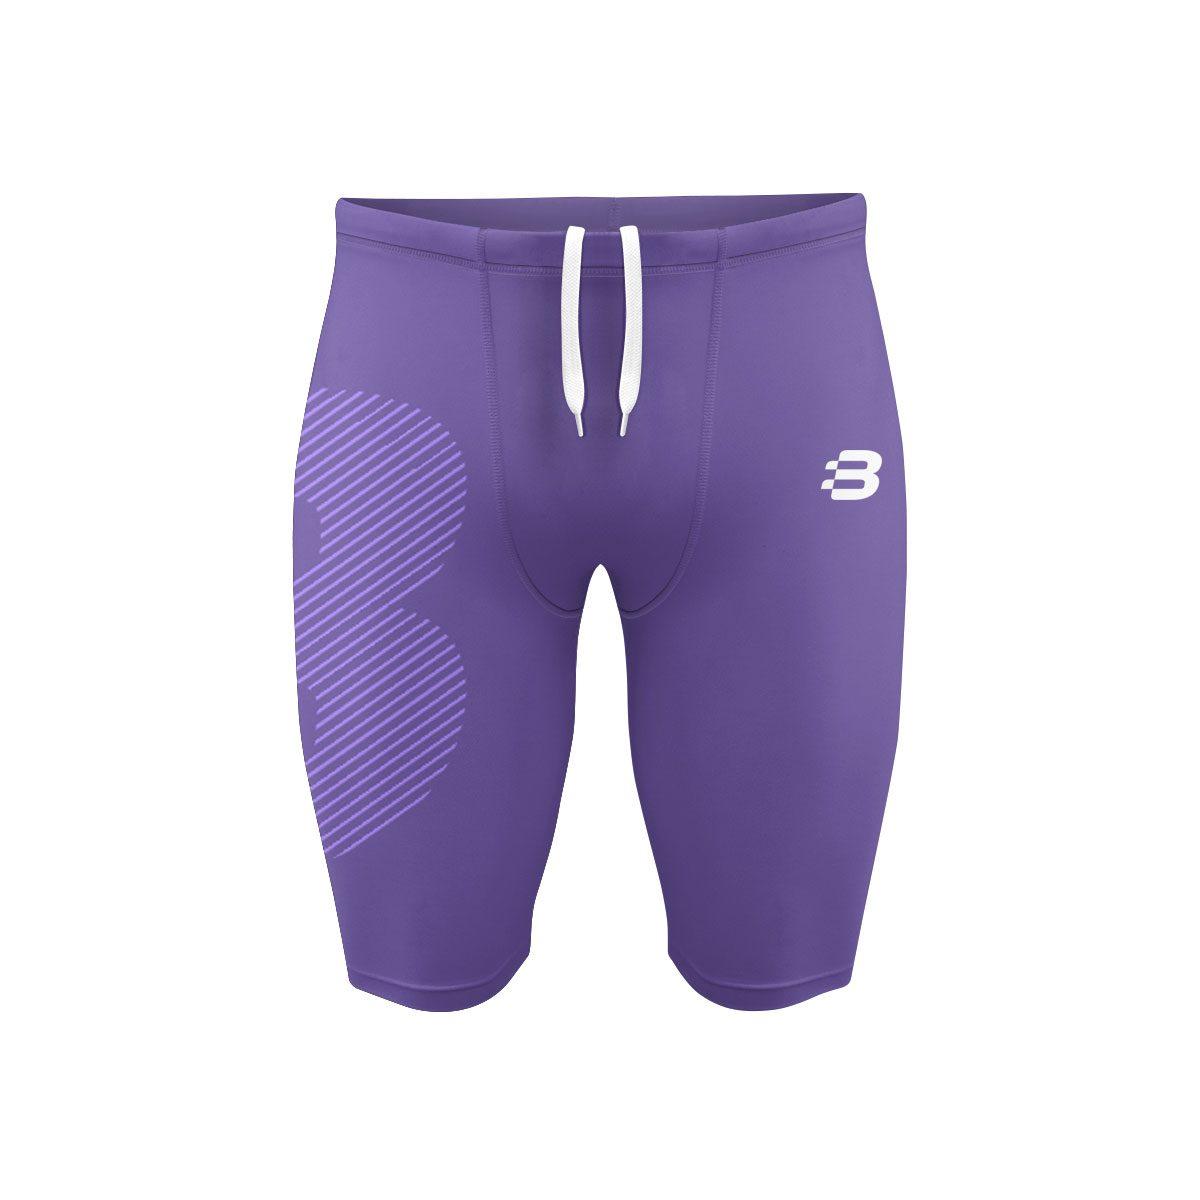 Mens Compression Shorts - Purple